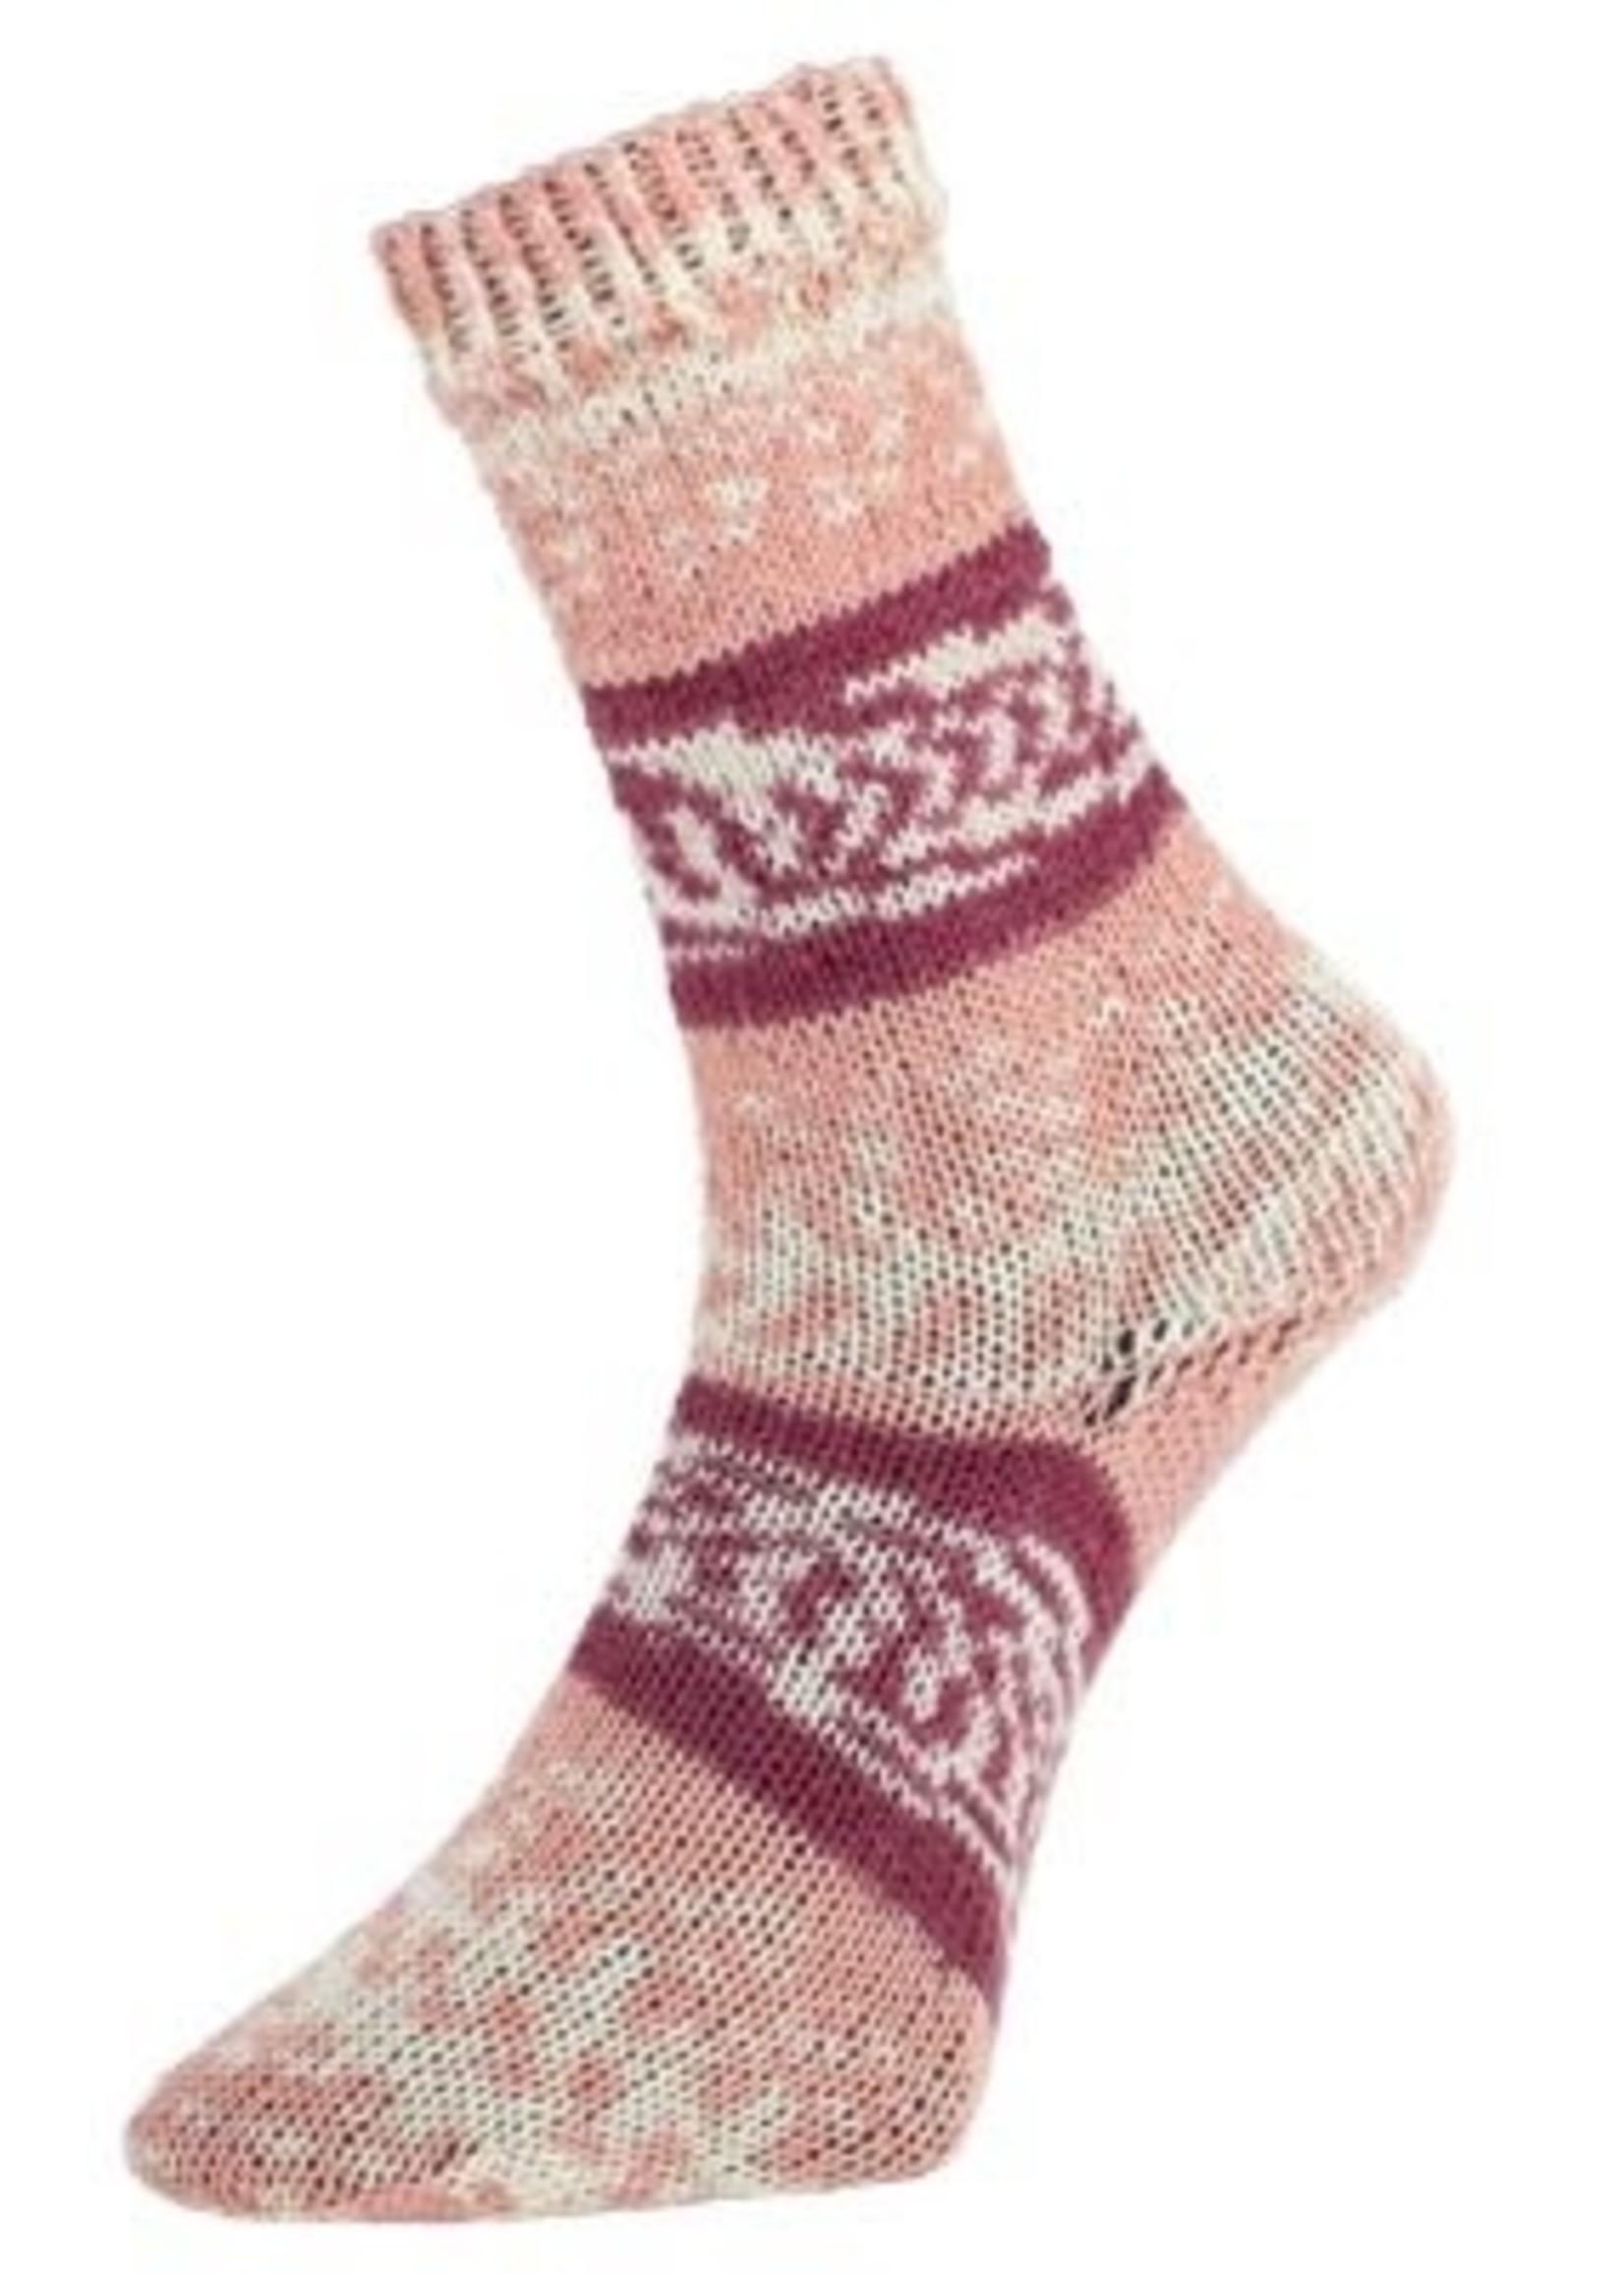 Pro Lana Pro Lana Sock Yarn Golden Fjord 4 Ply - #189 Bordeaux